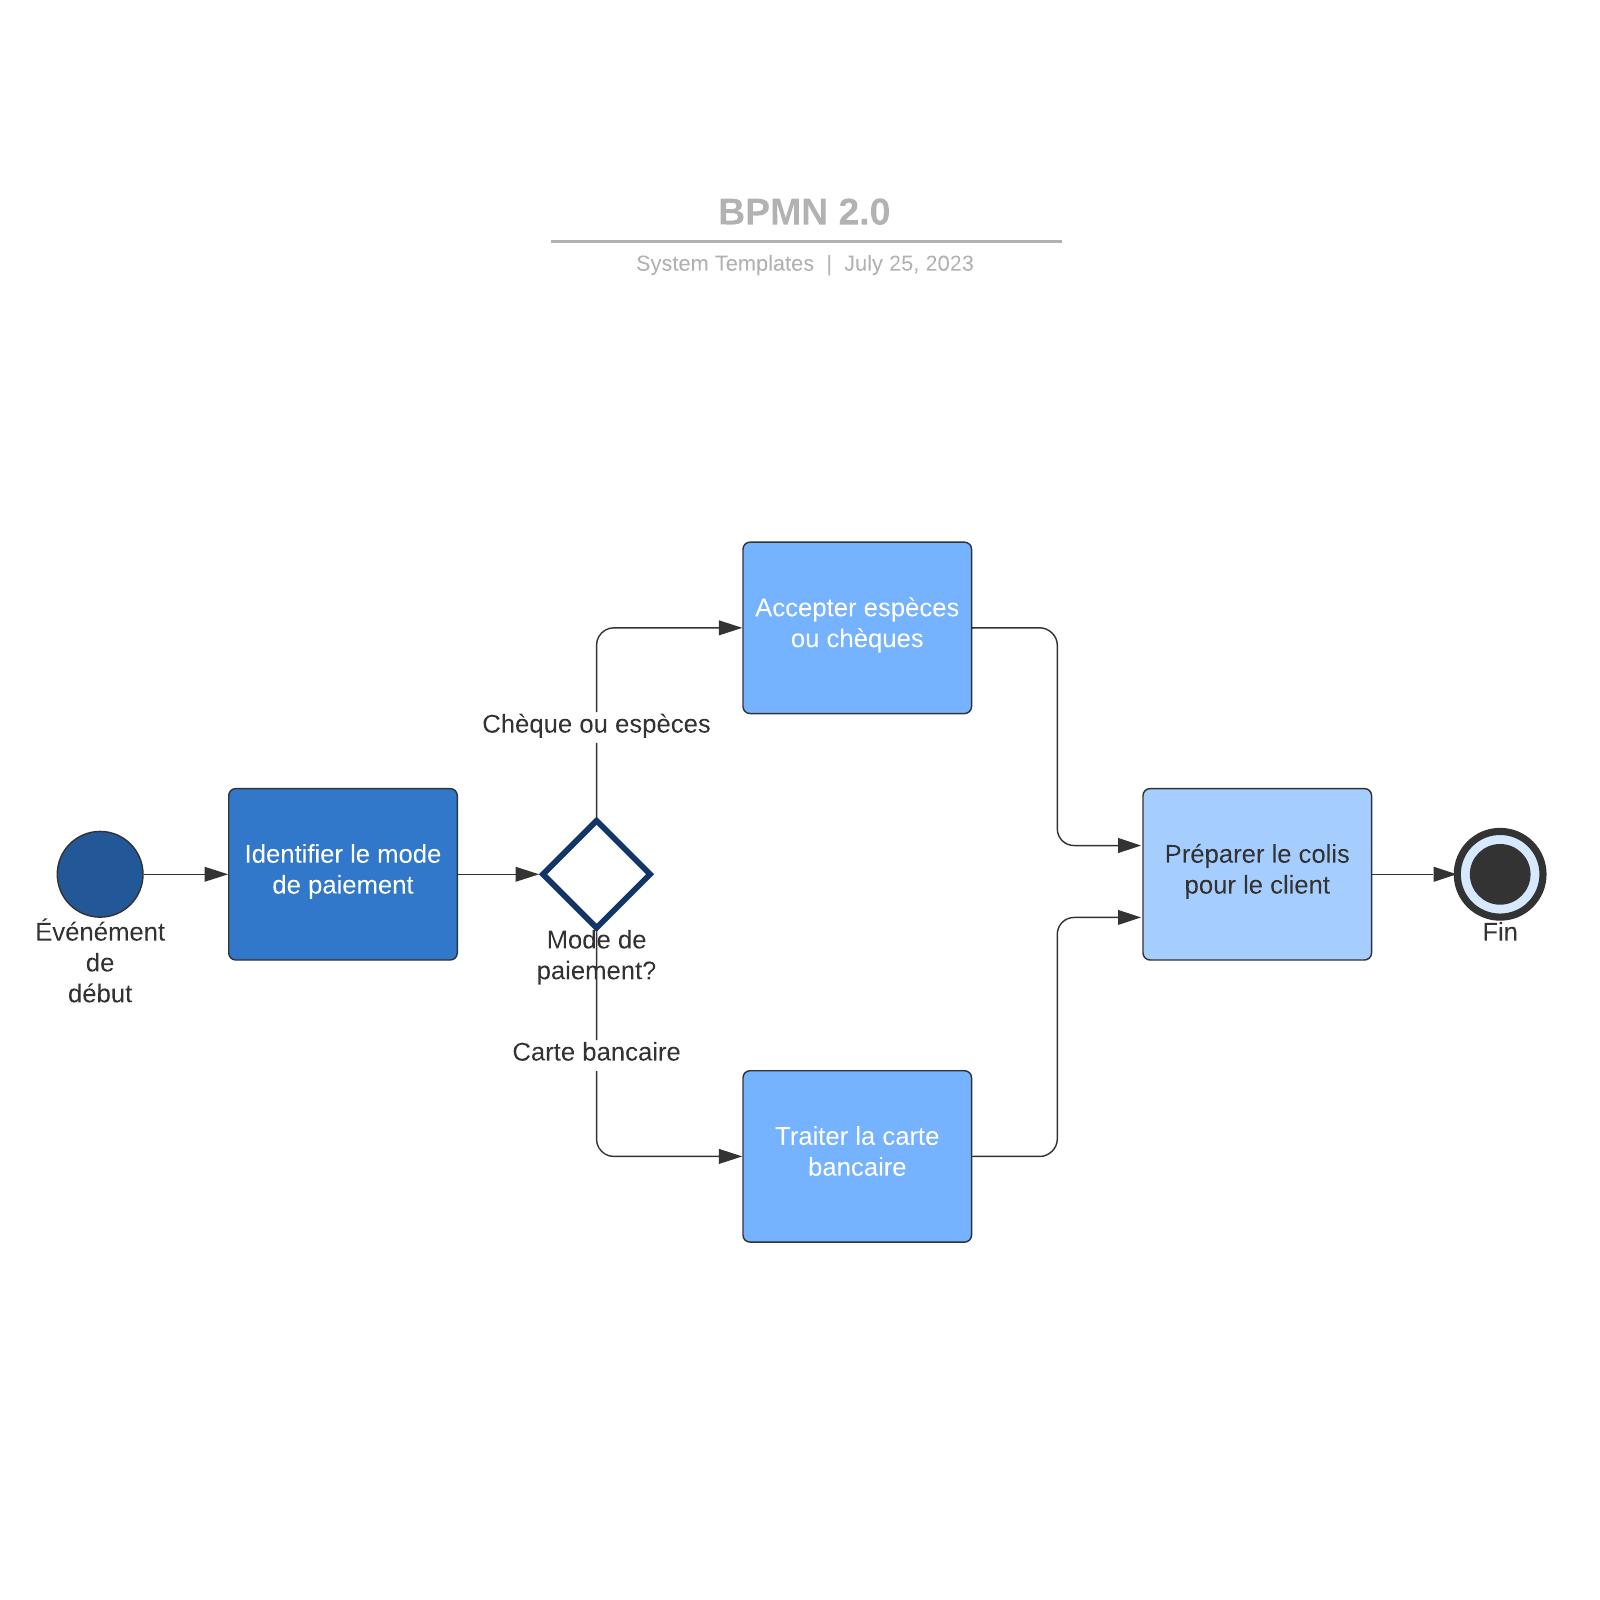 exemple de diagramme bpmn 2.0